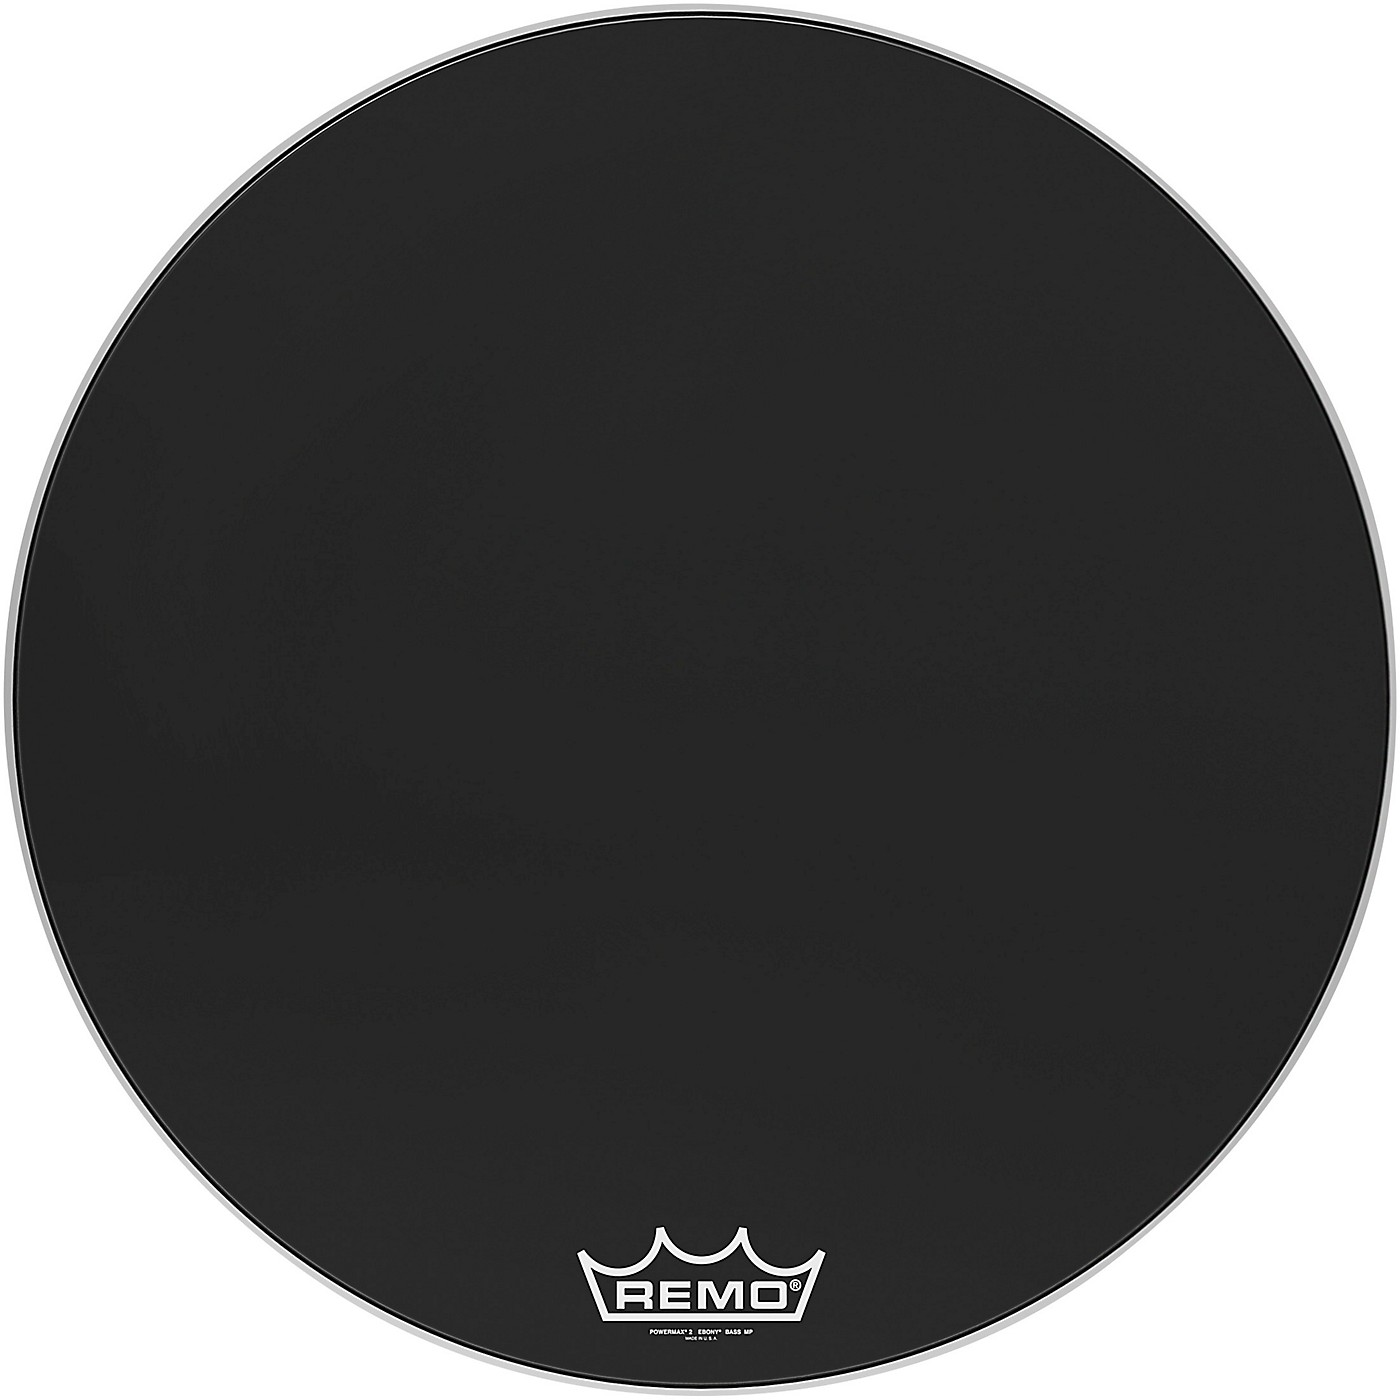 Remo Powermax 2 Ebony Crimplock Bass Drum Head thumbnail